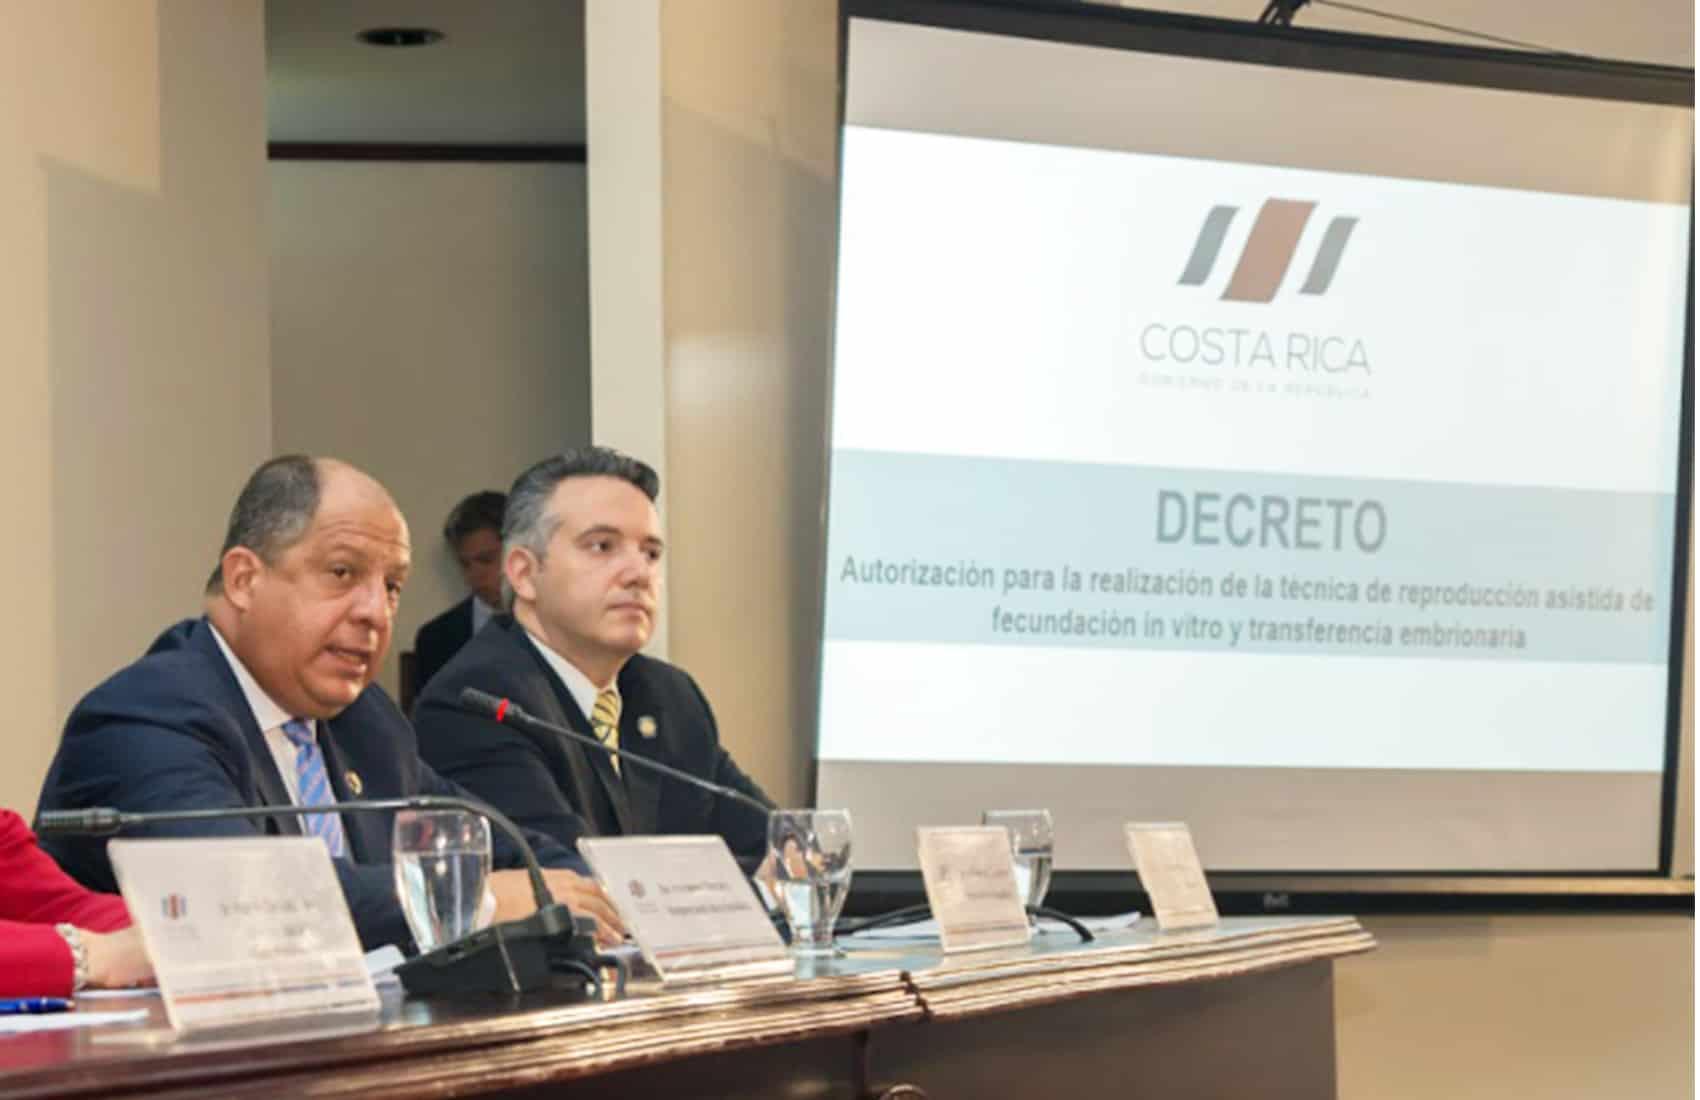 President Luis Guillermo Solís, IVF decree. Sept. 3, 2015